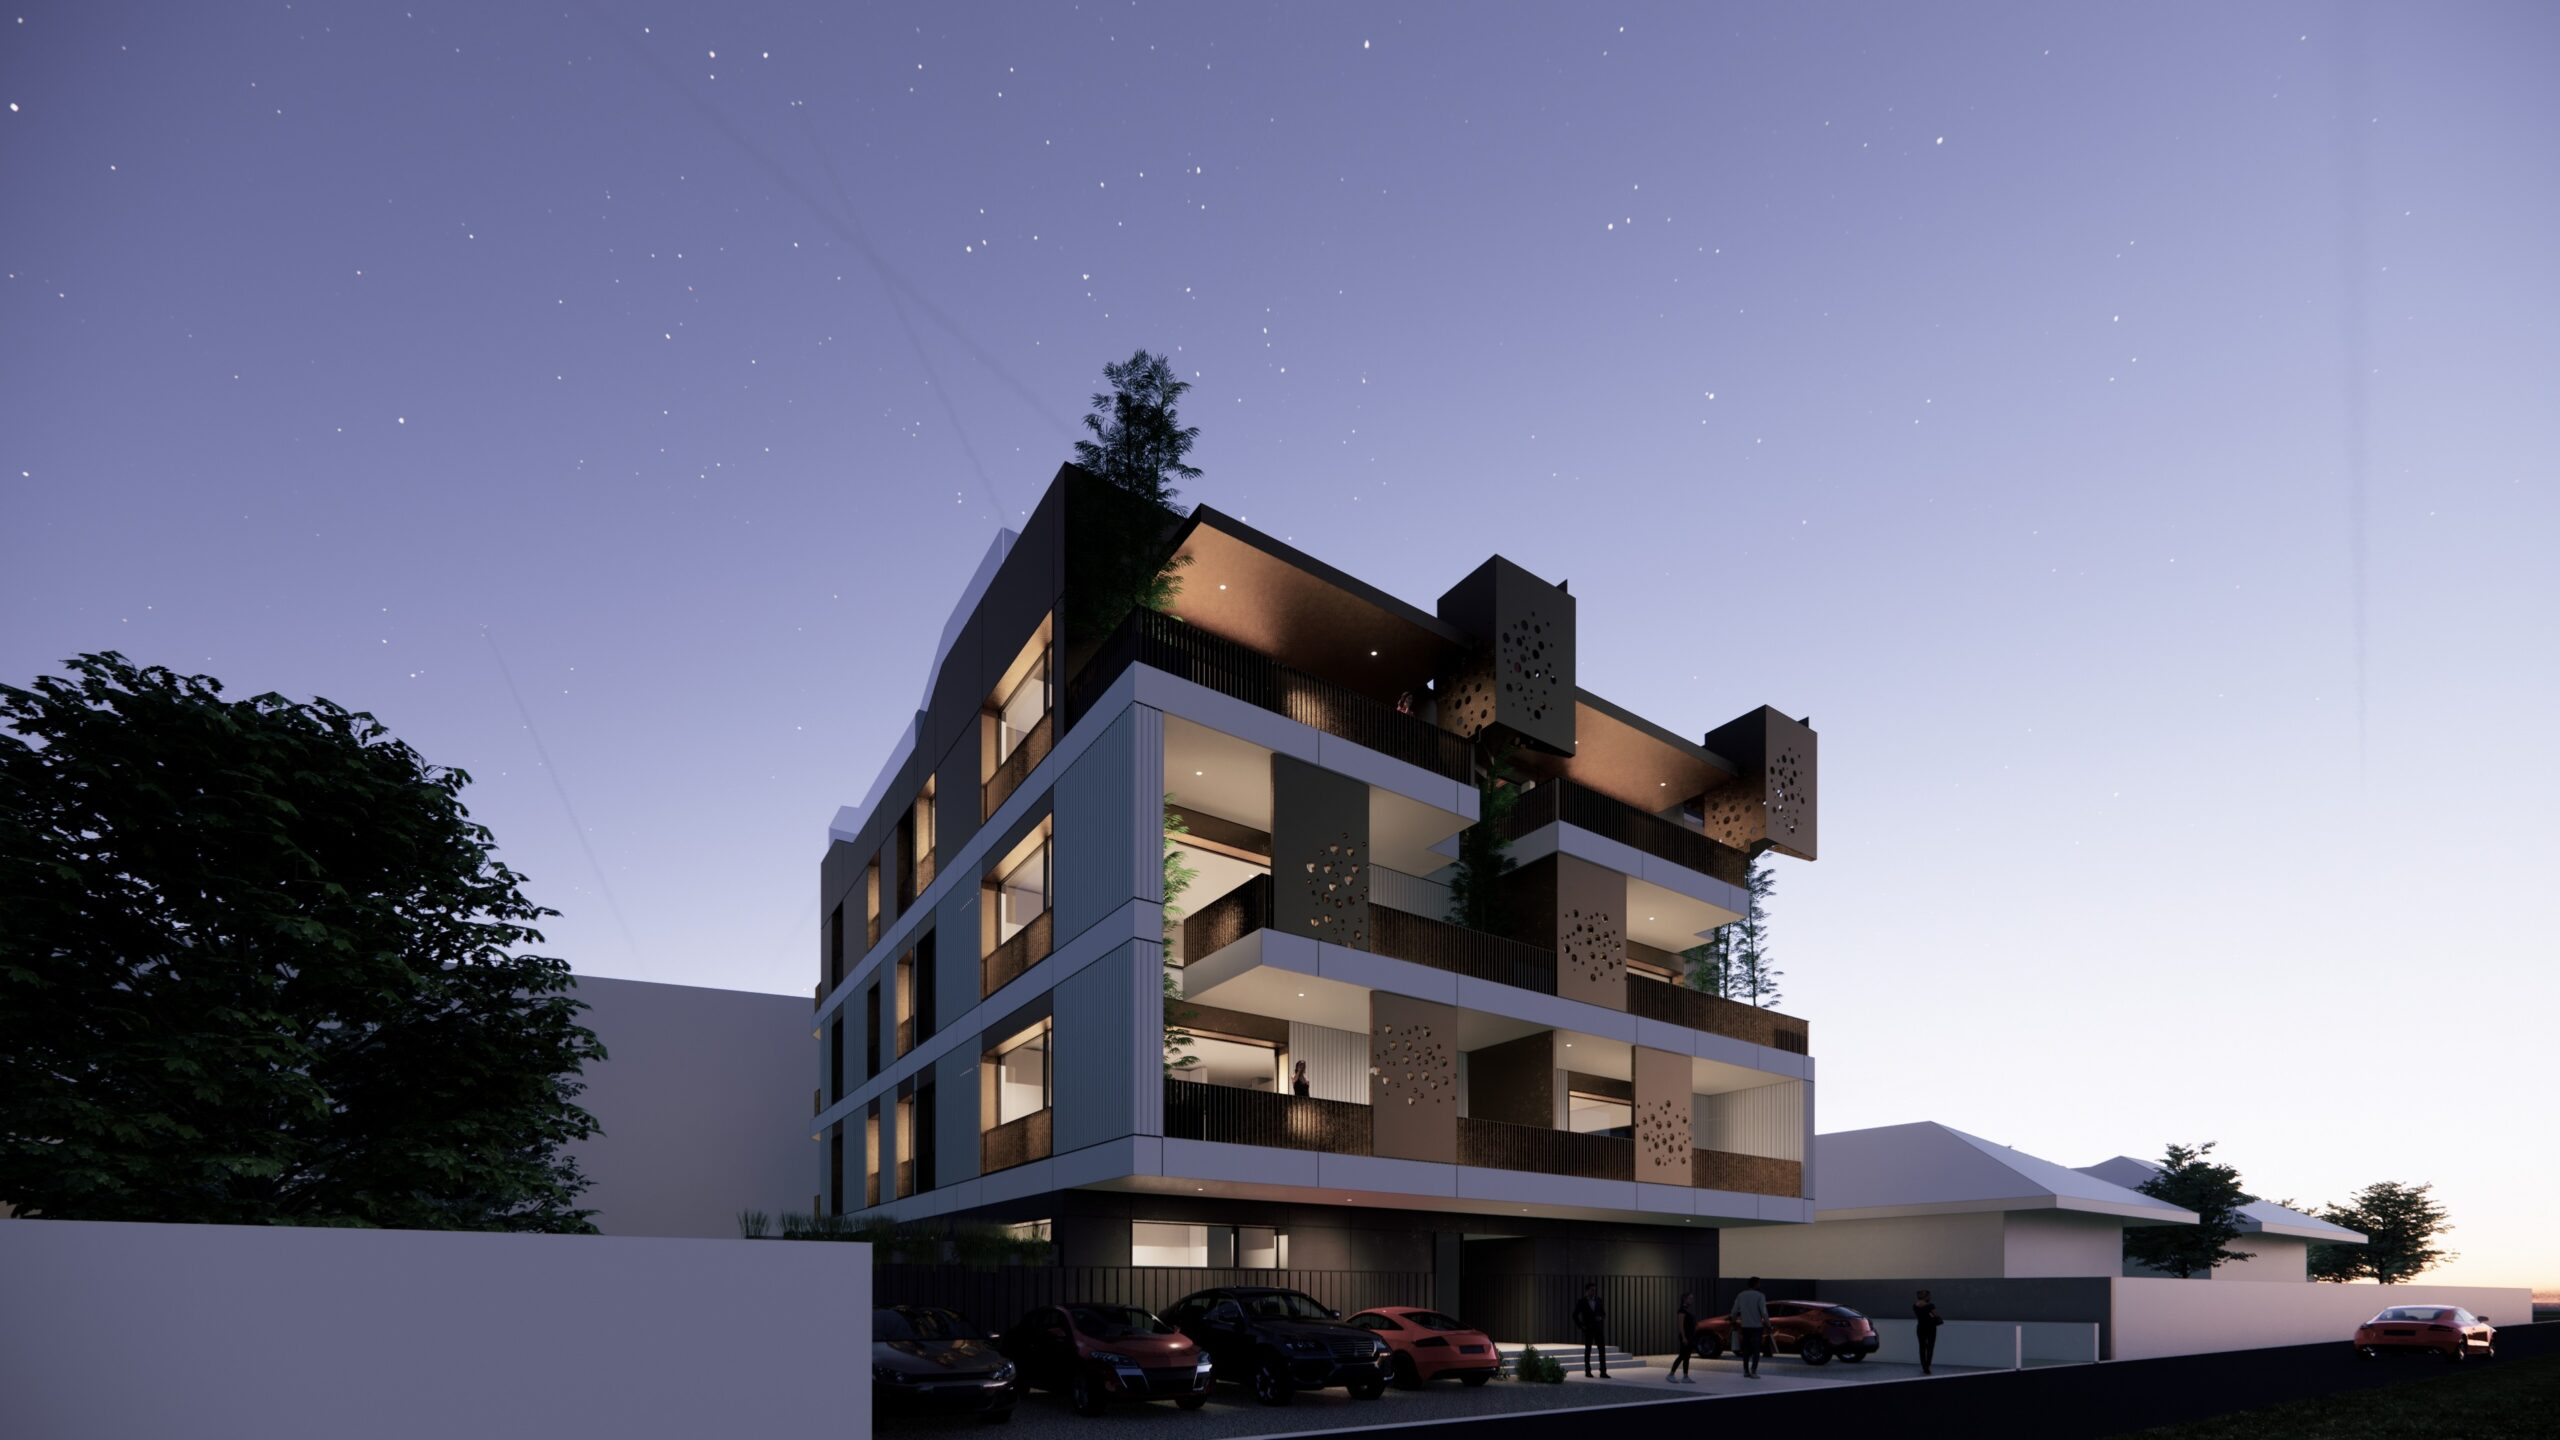 https://nbc-arhitect.ro/wp-content/uploads/2021/09/Jandarmeriei-5-scaled.jpg